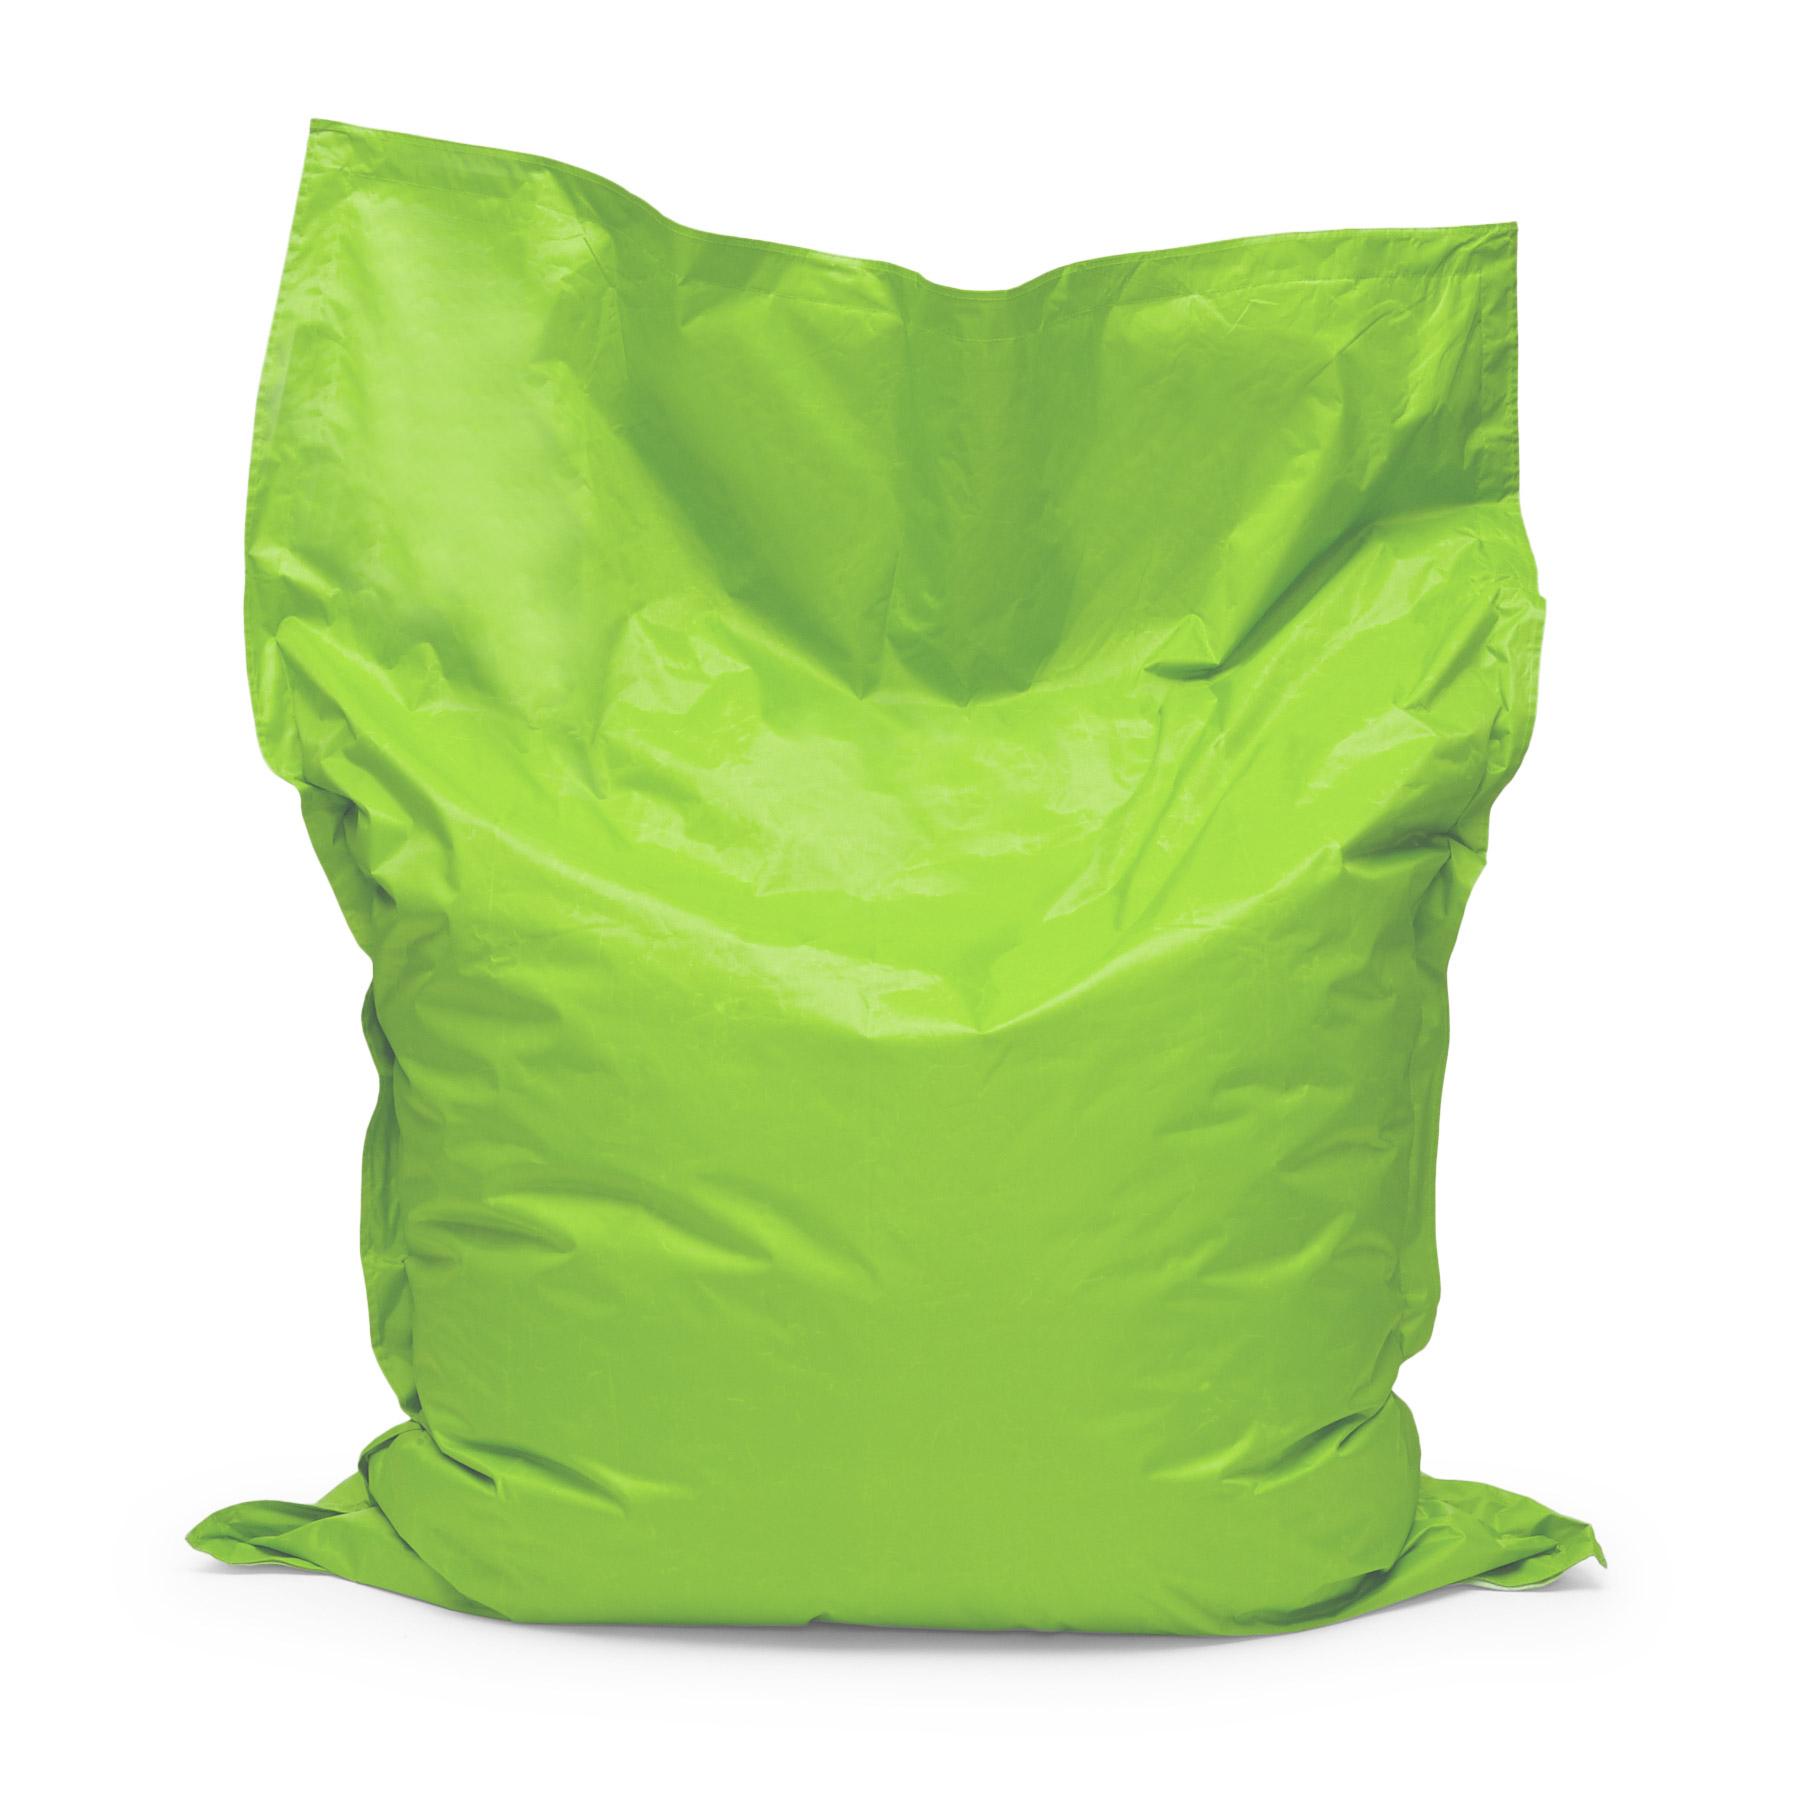 Green Bean Bag